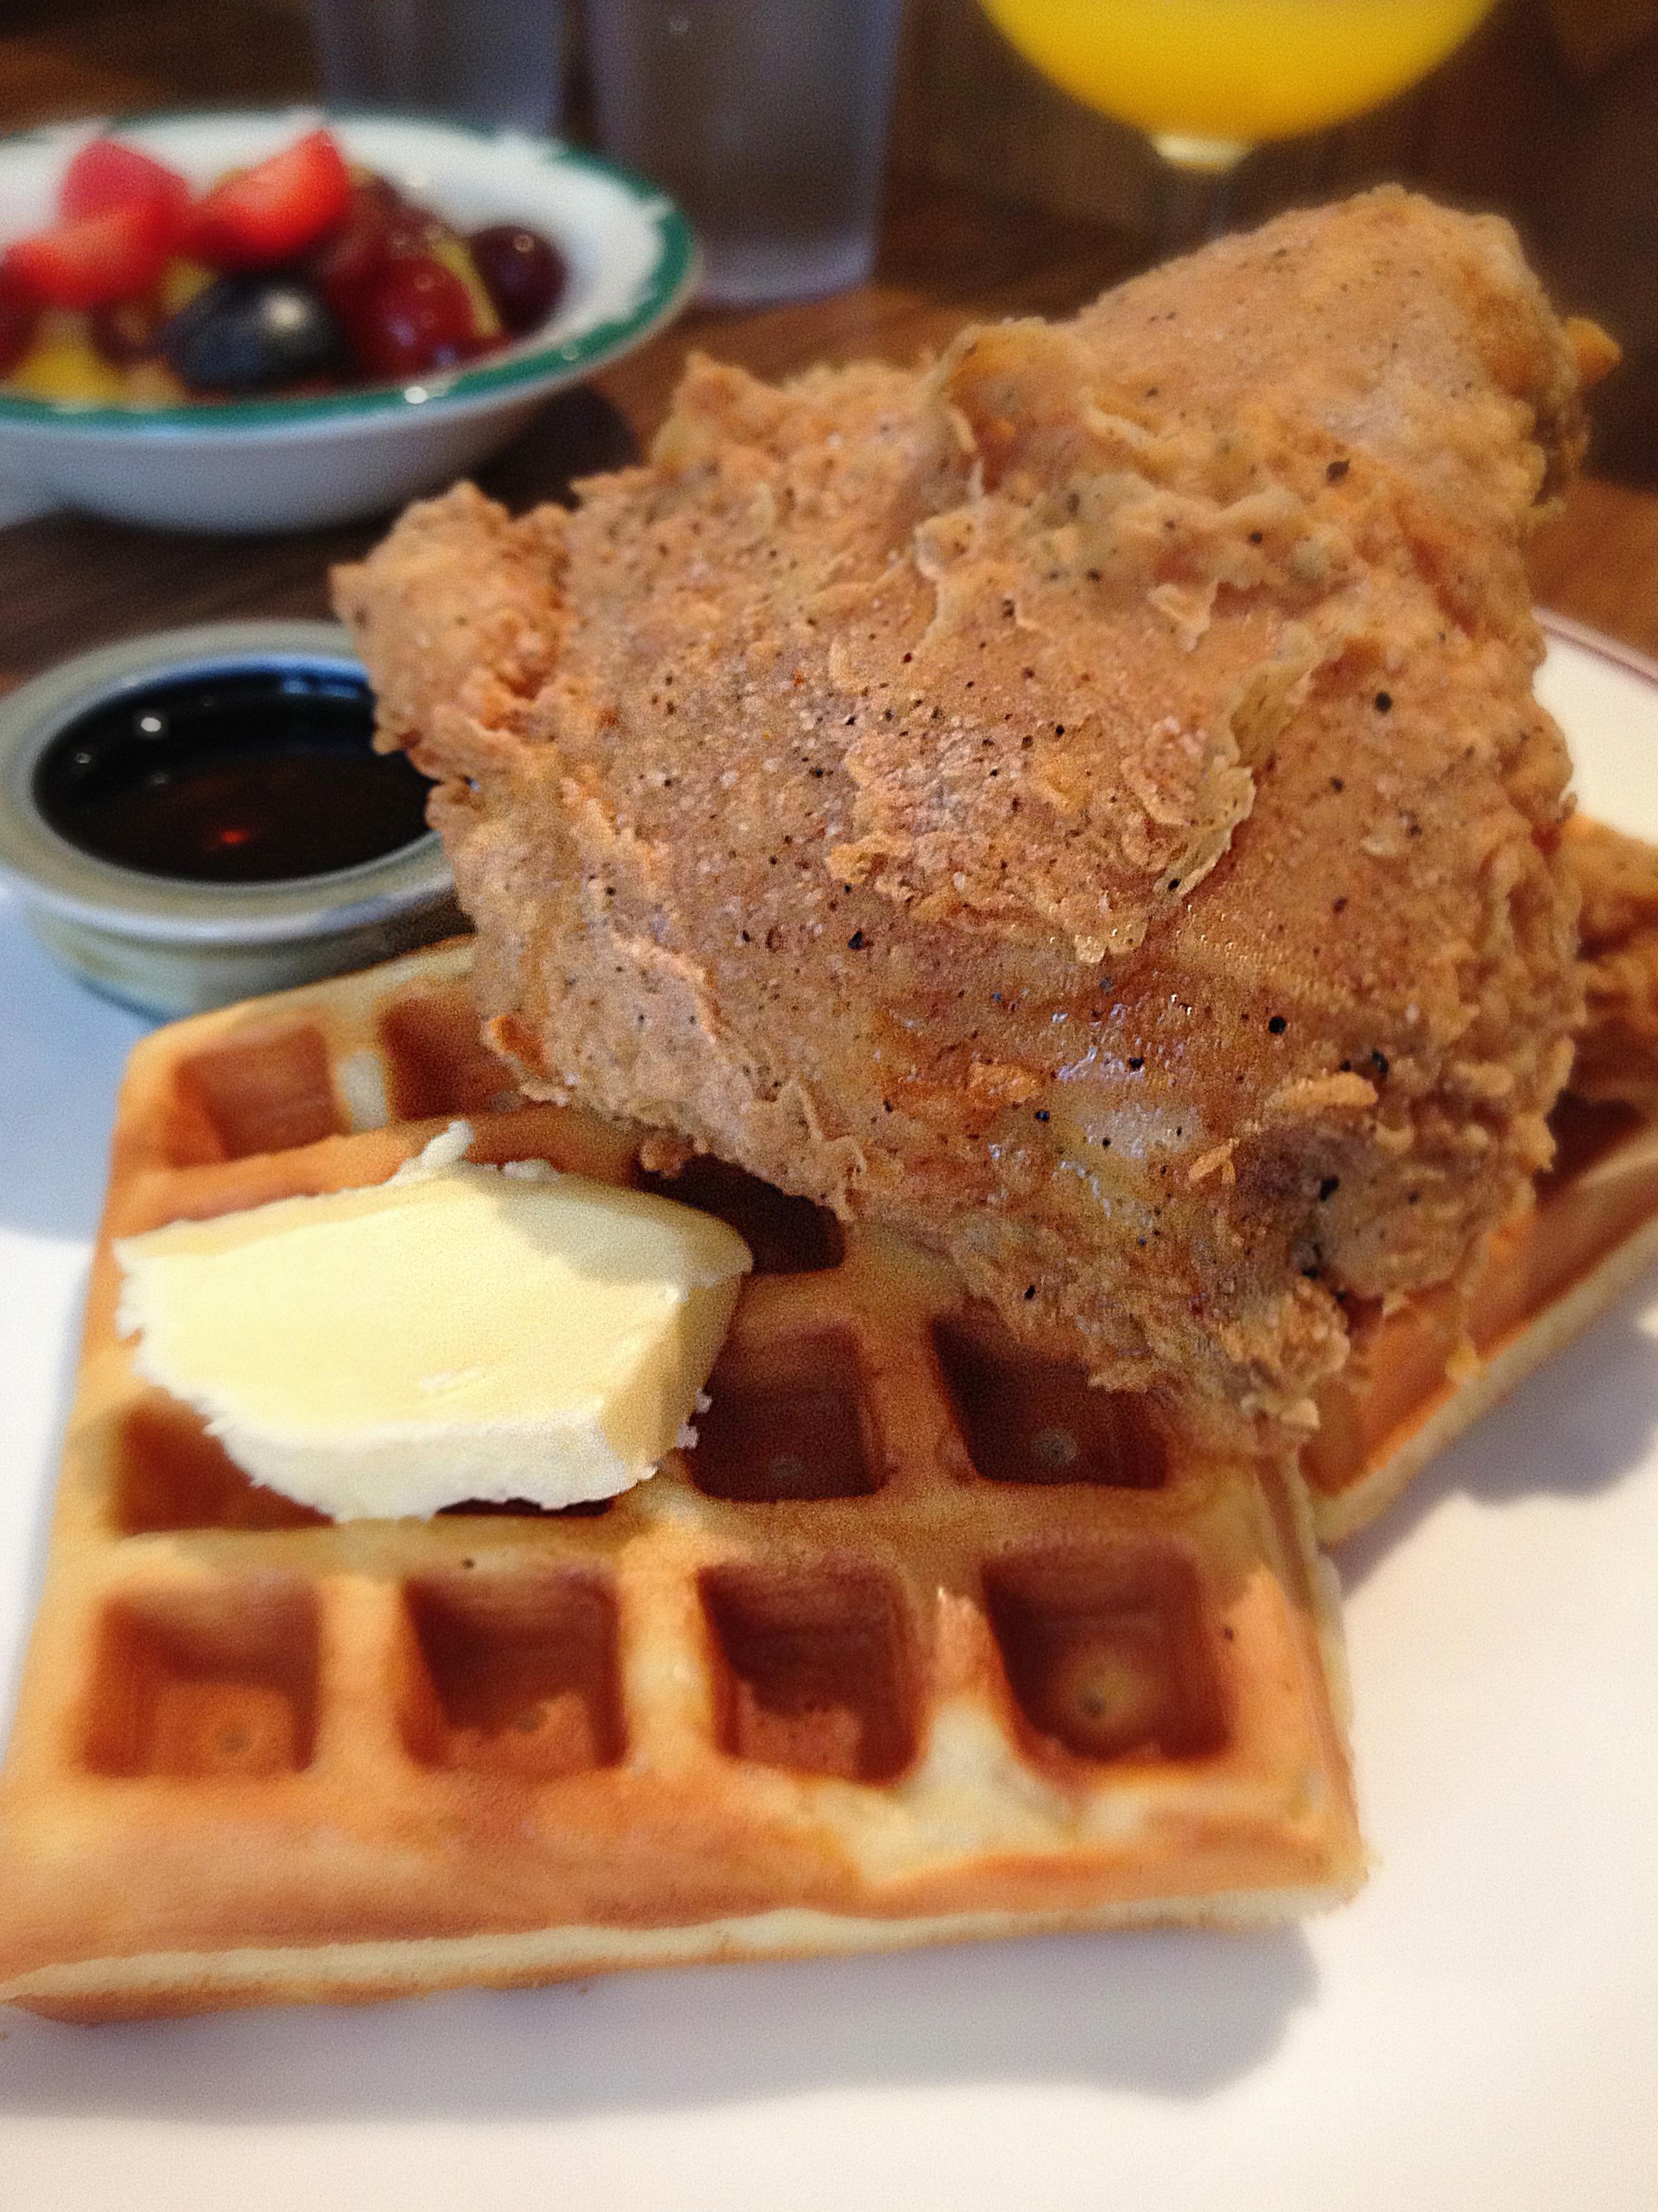 Nouveau Palais' Fried Chicken & Waffle